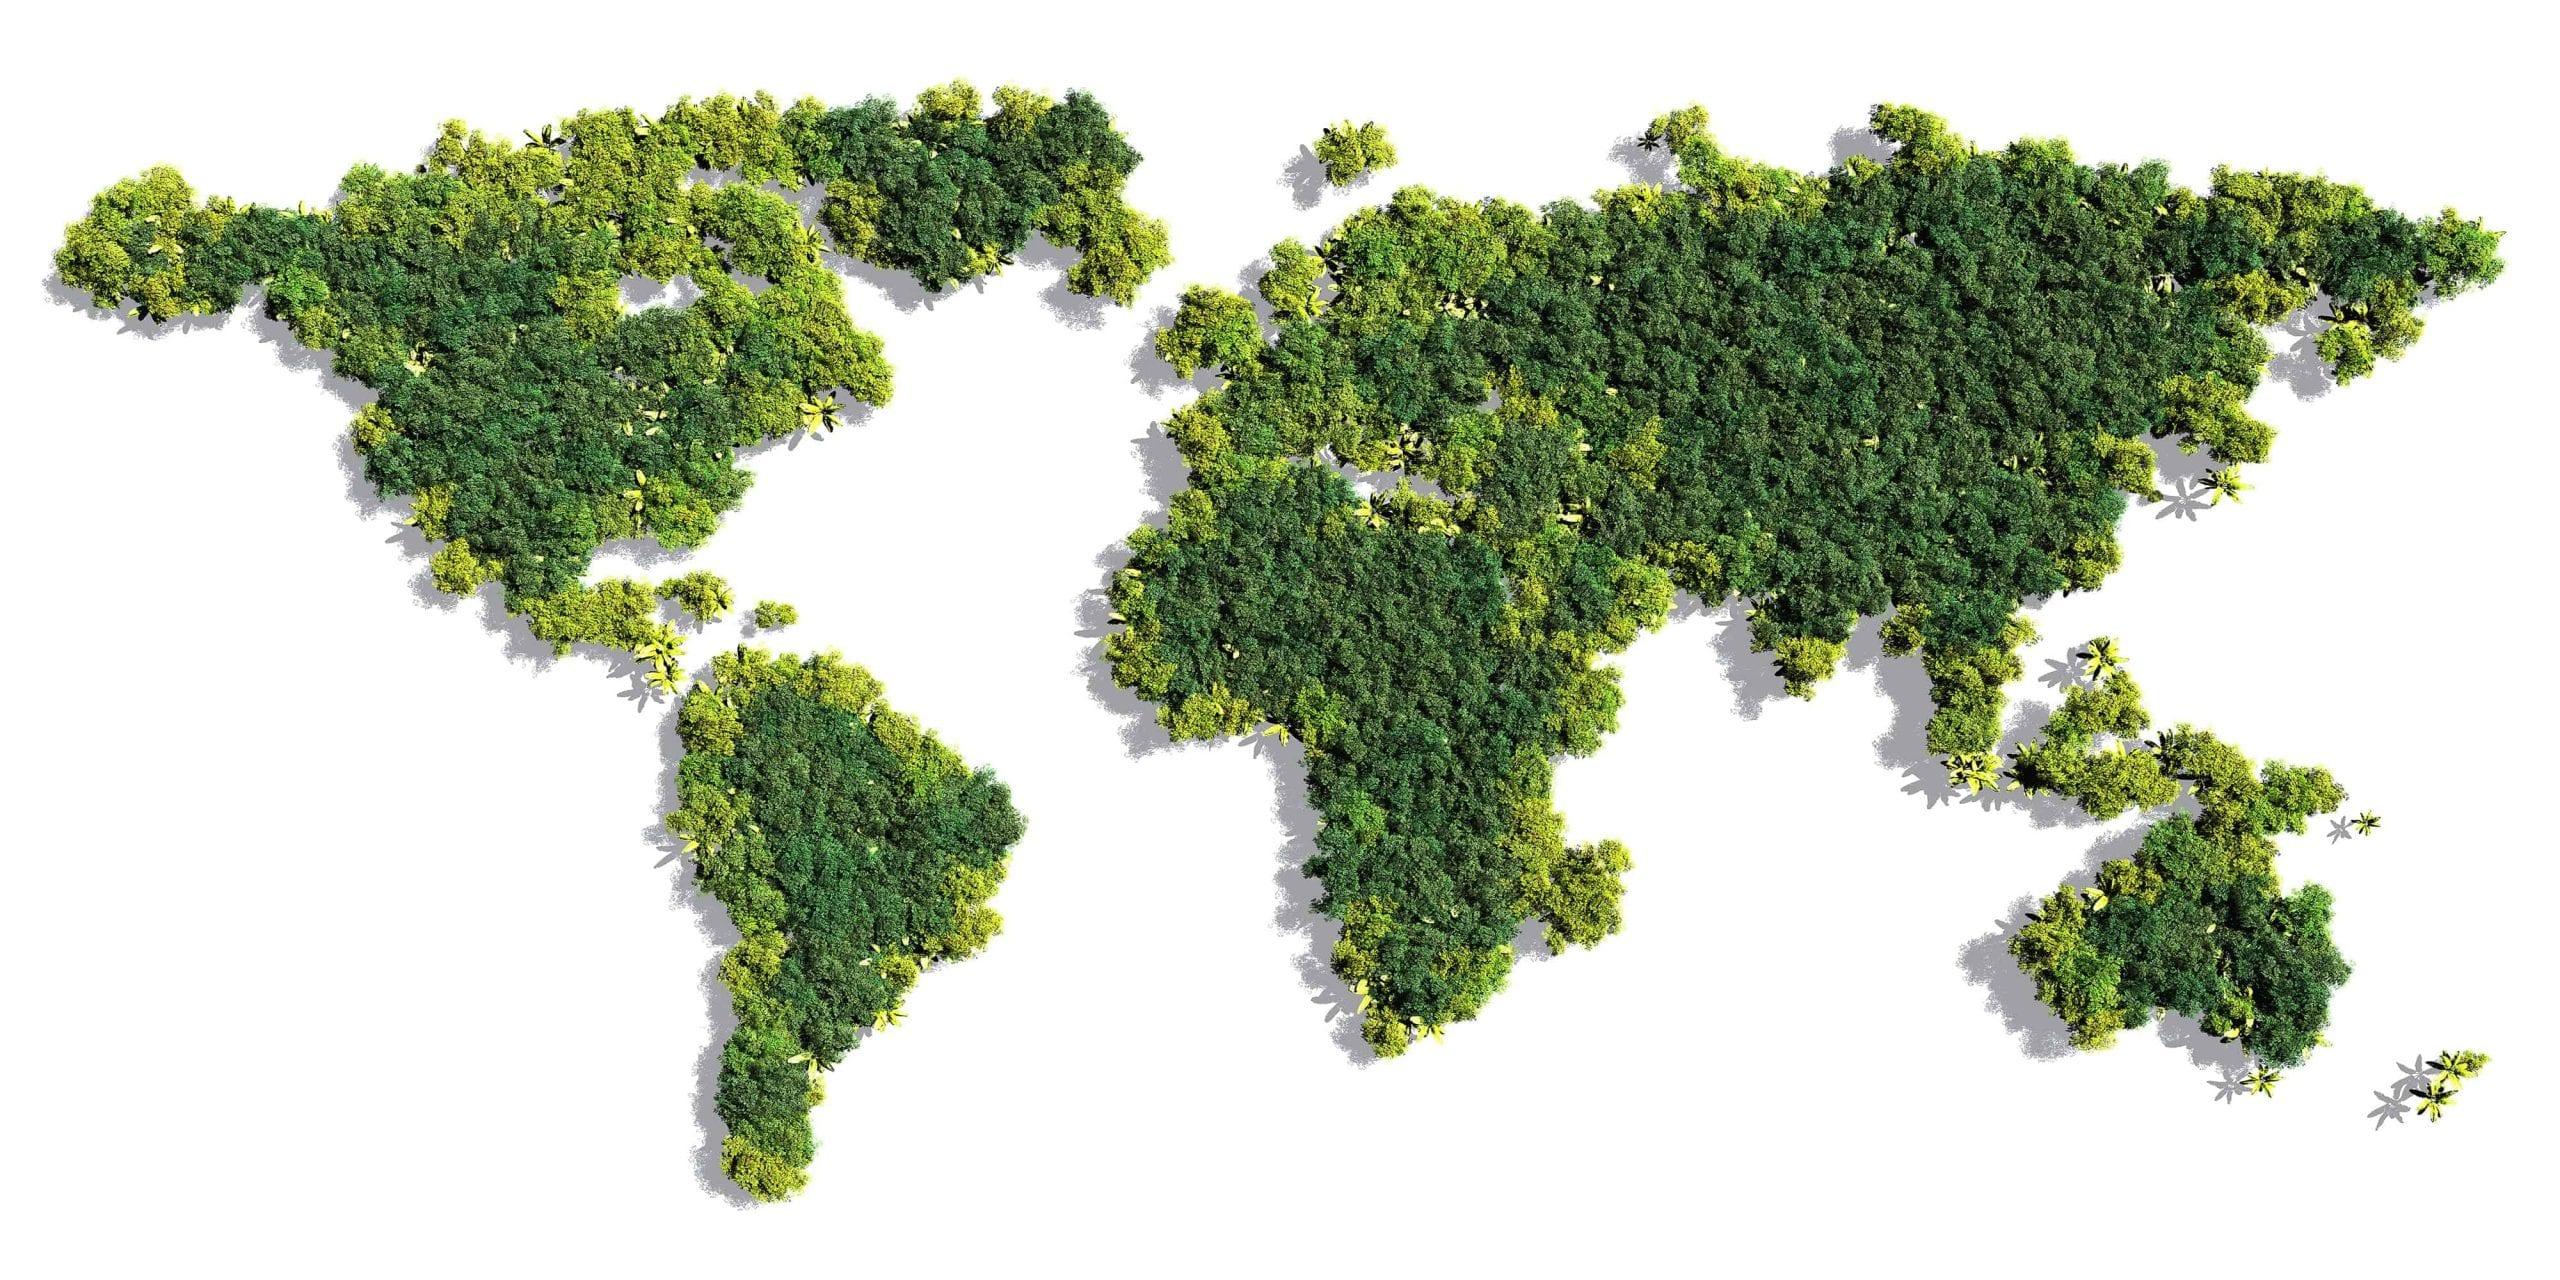 world's largest hemp producers